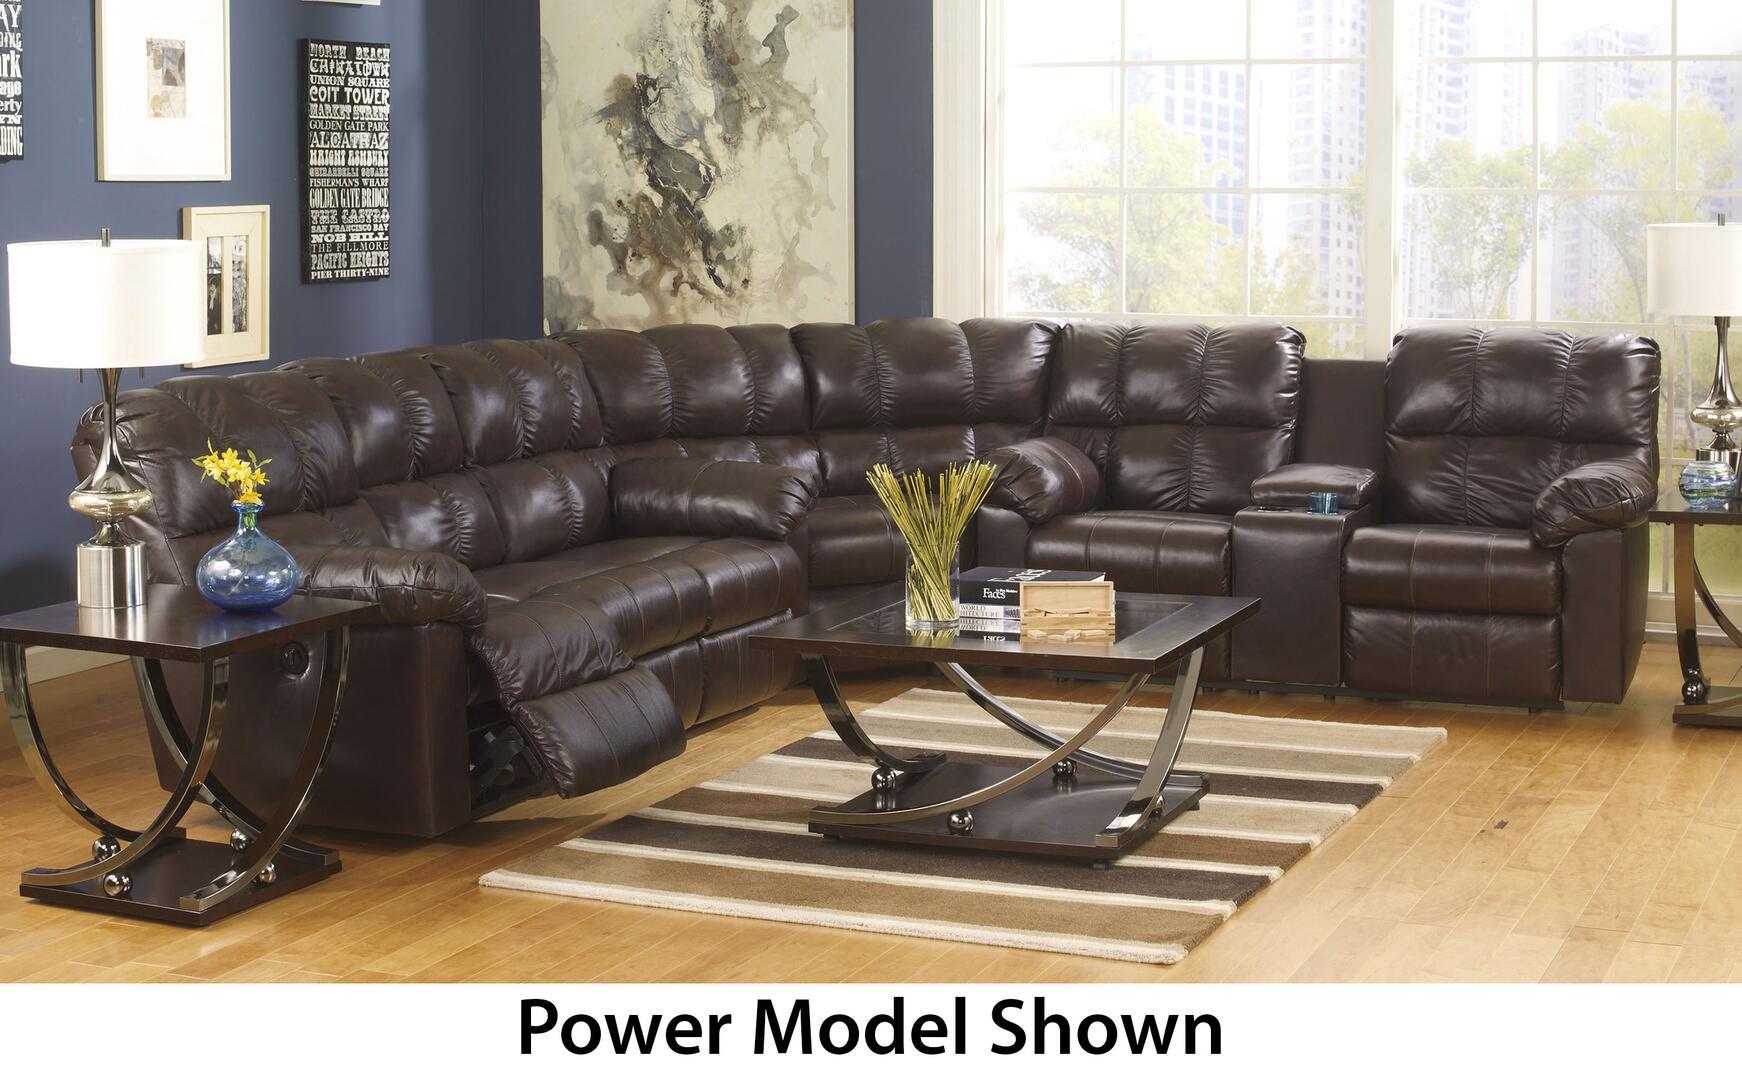 milo corner sofa groupon review half moon leather home the honoroak